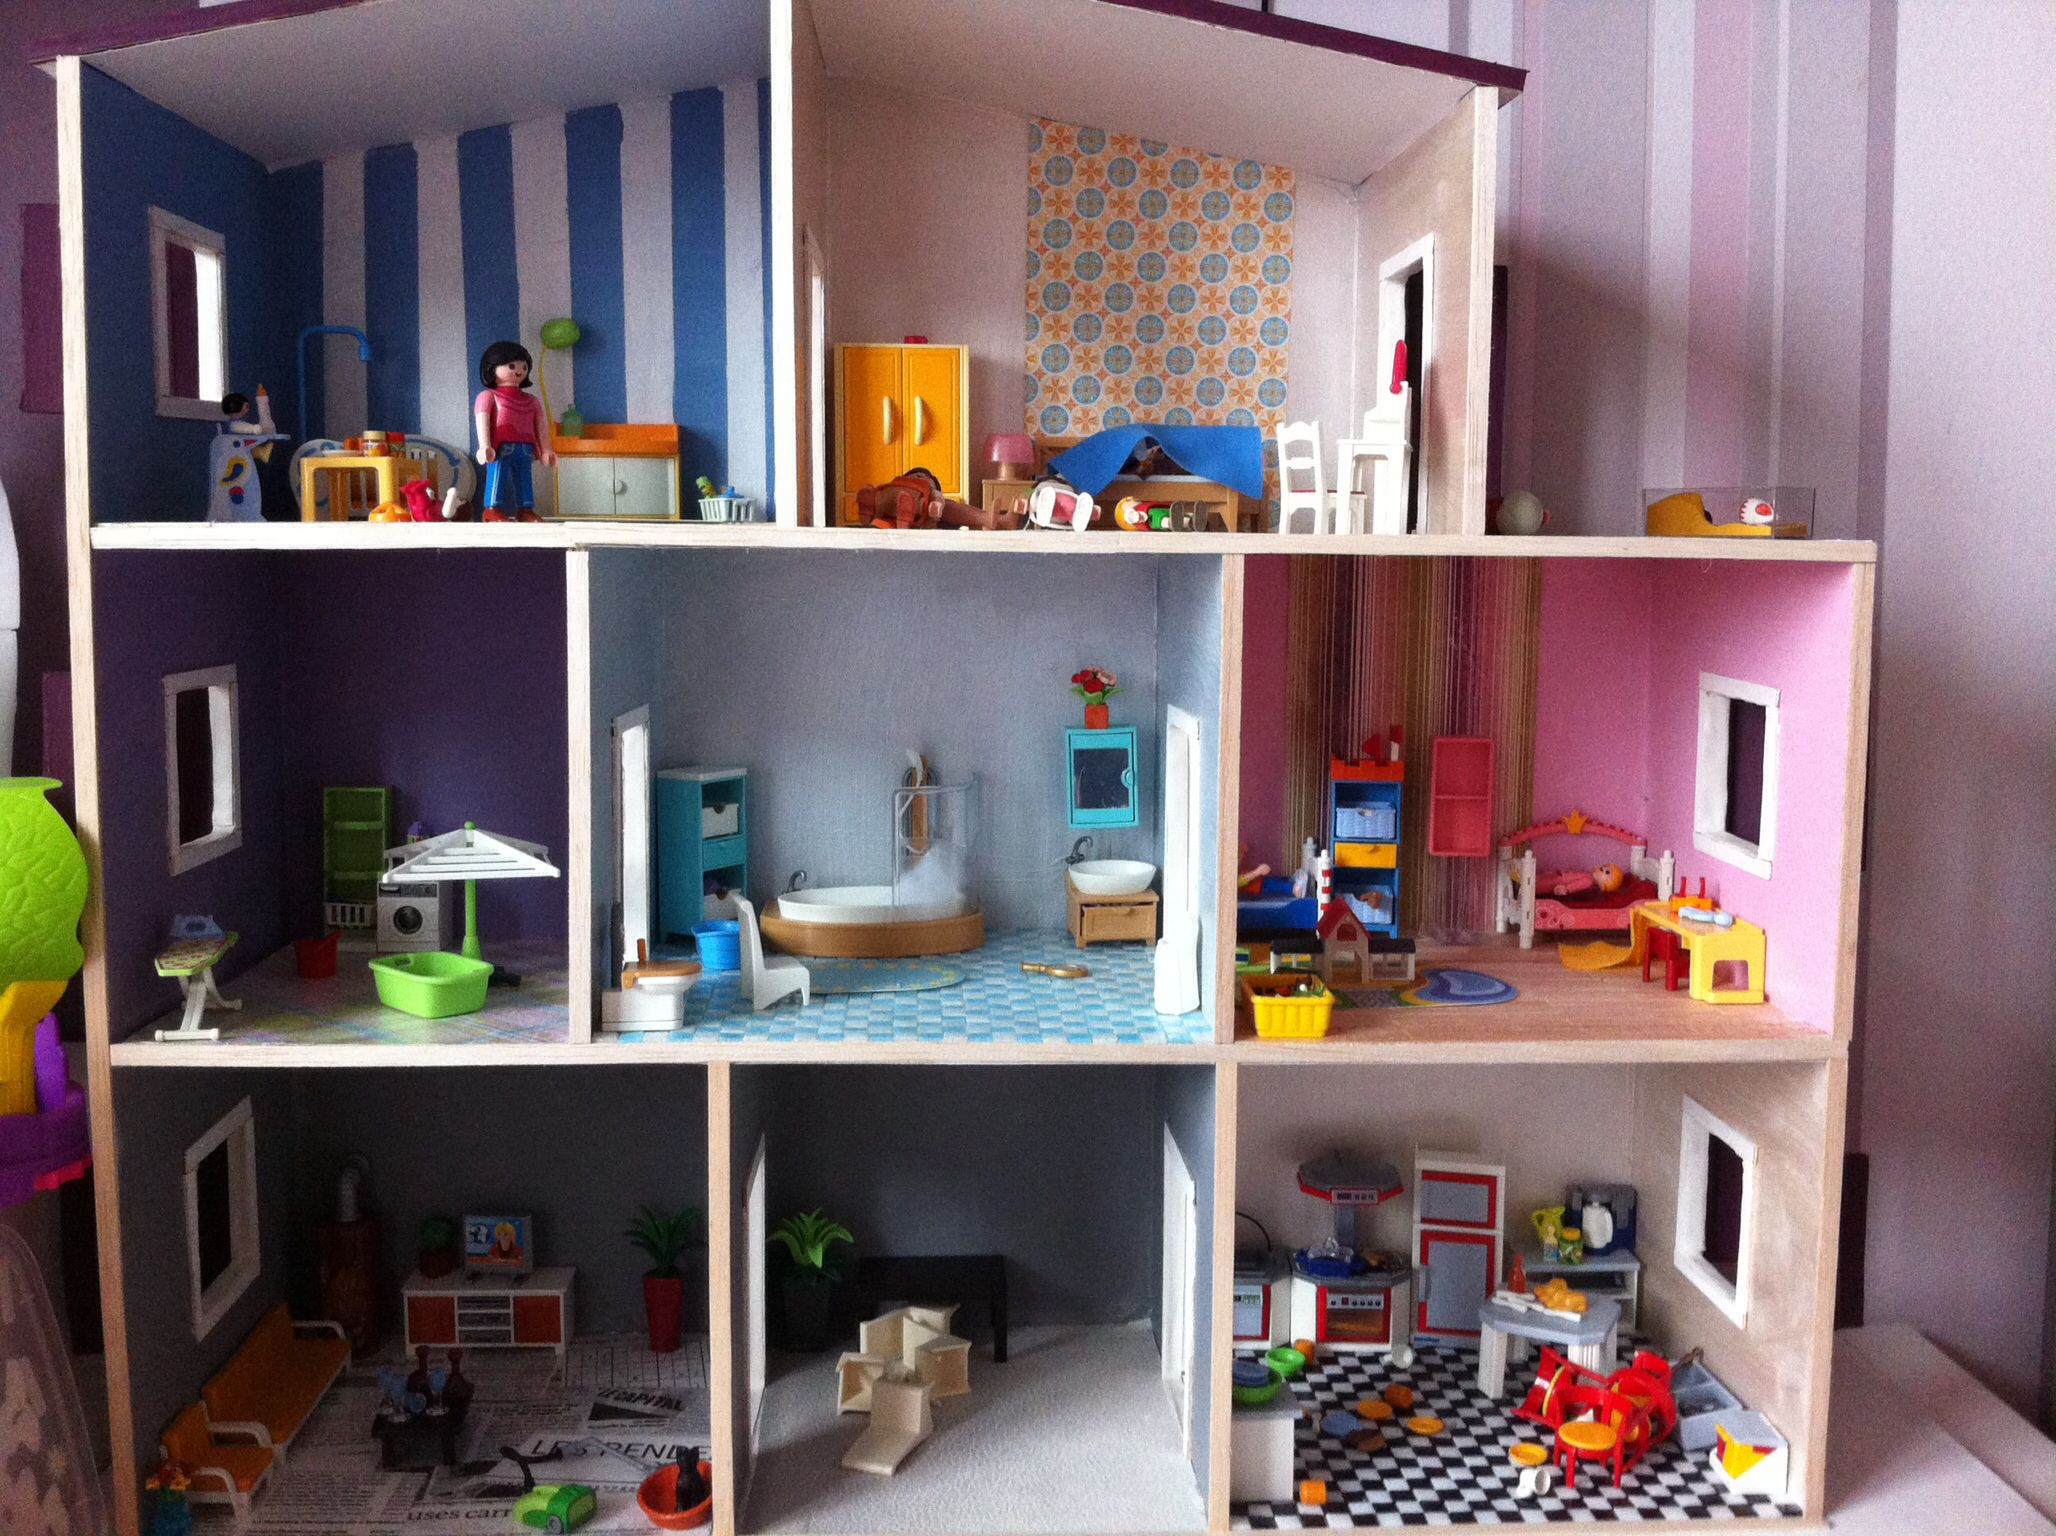 Maison playmobile playmobil maison playmobil playmobil et maison - Maison en bois playmobil ...